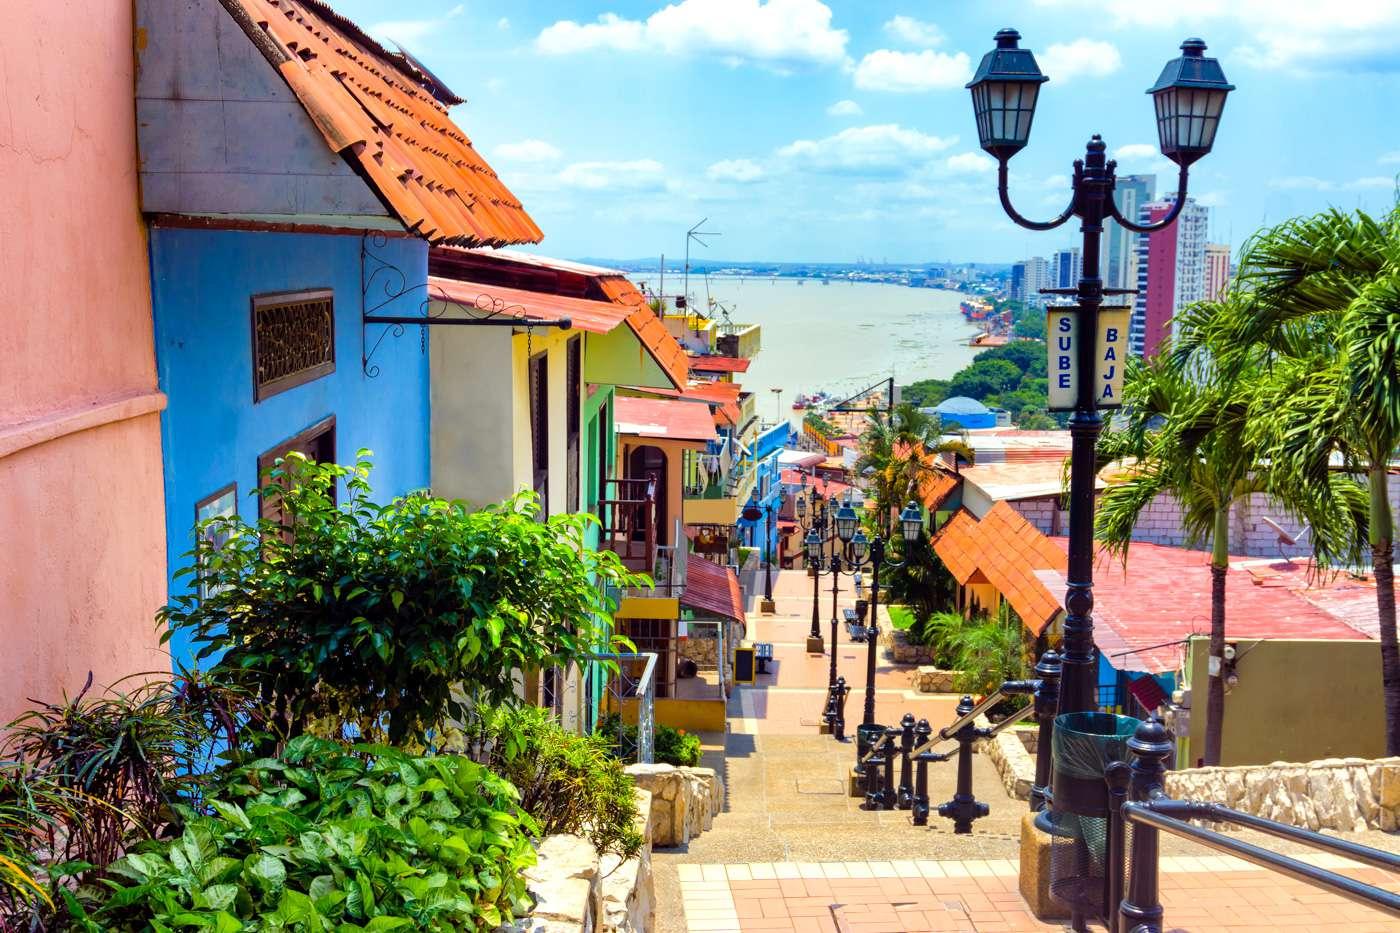 Unique places to visit in Guayaquil